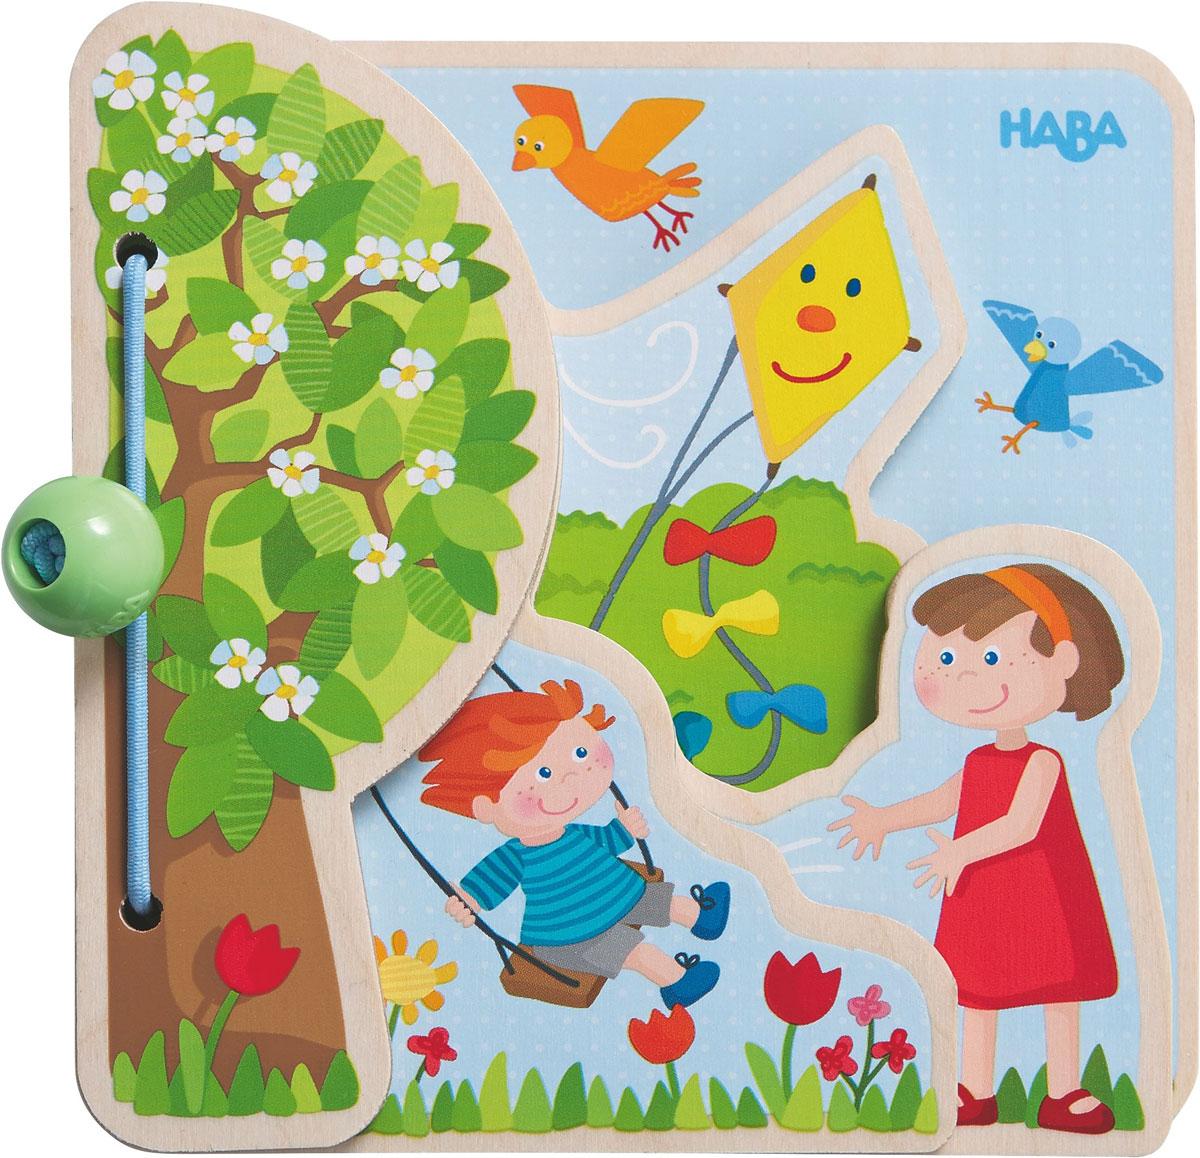 Haba Обучающая игра Детская книга Четыре сезона haba вешалка крючок haba бабочка фани арт 8598